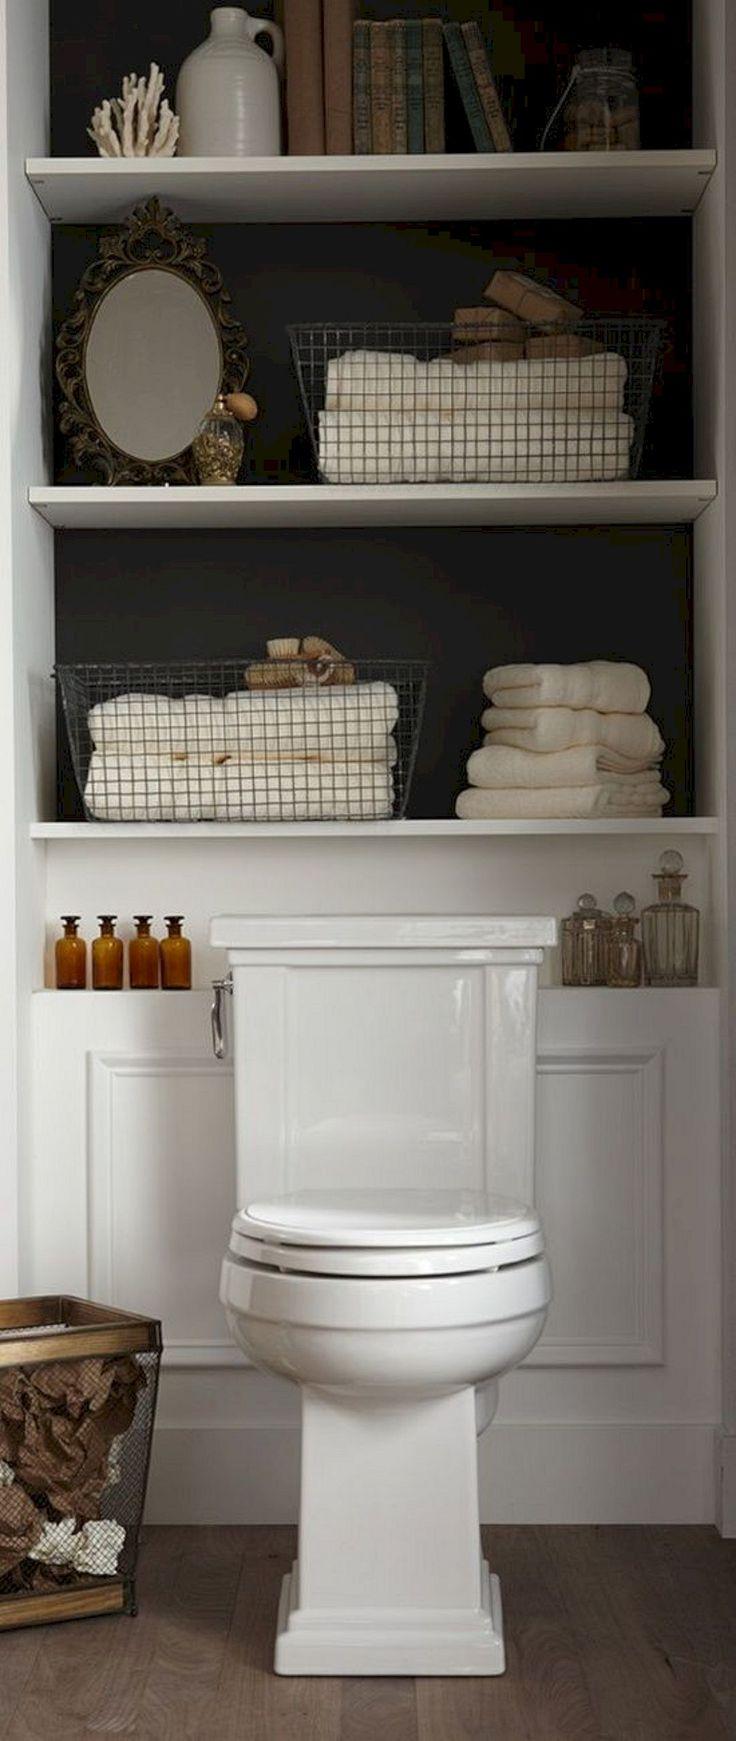 The Best Diy Master Bathroom Ideas Remodel On A Budget No 10 — Design & Decora…   – Bathroom/laundry Organizing